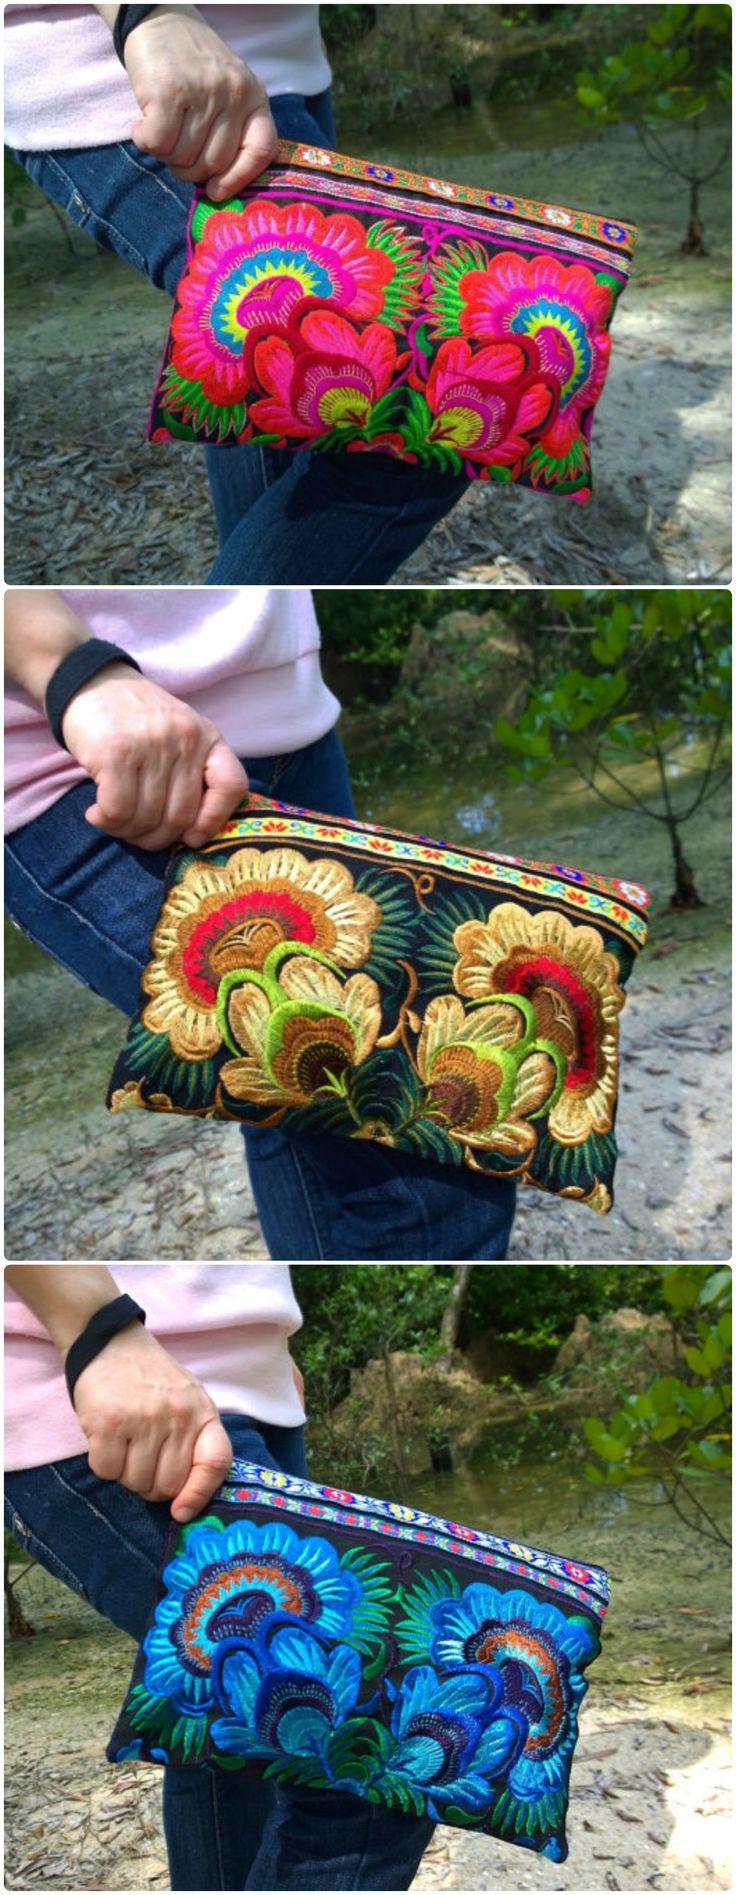 Boho Clutch - Hmong Clutch Bag -Embroidery Floral Bag - Bohemian Clutch ( FREE SHIPPING WORLDWIDE )